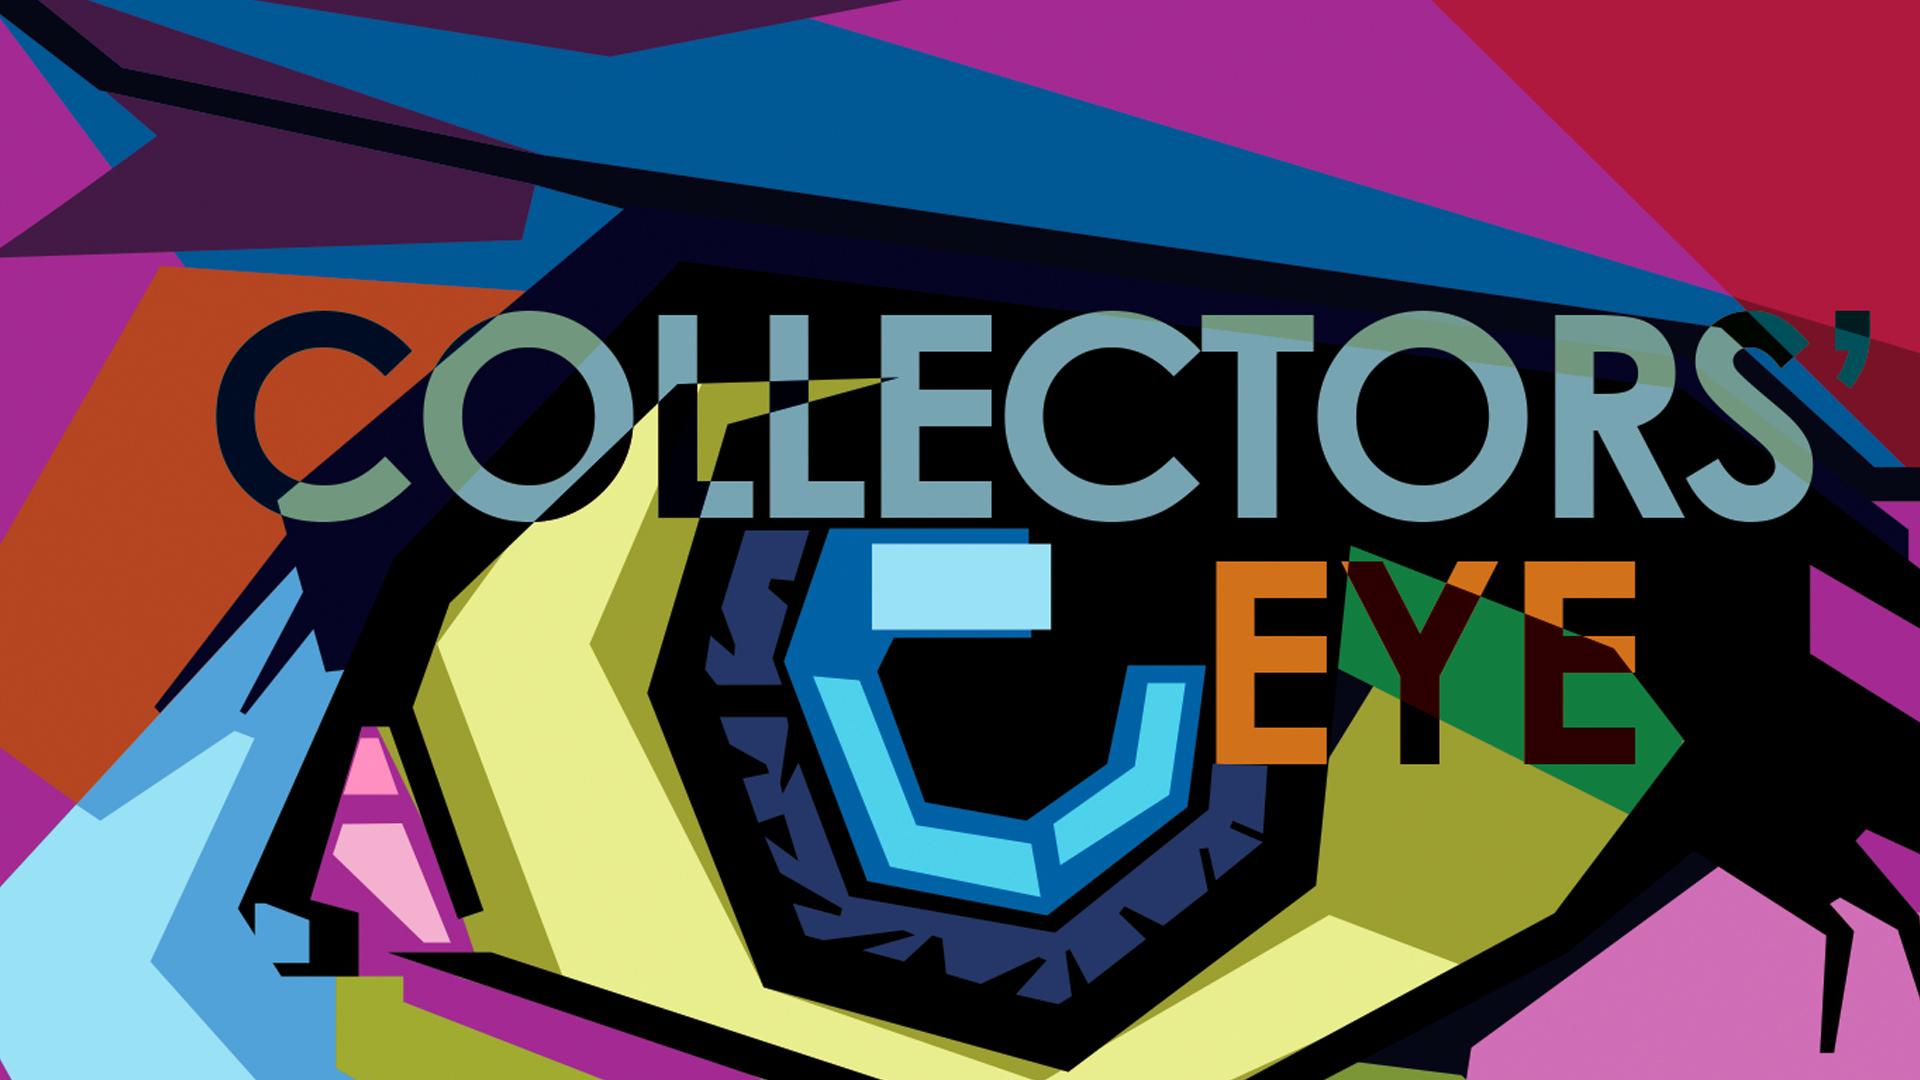 collectors eye 4.jpg